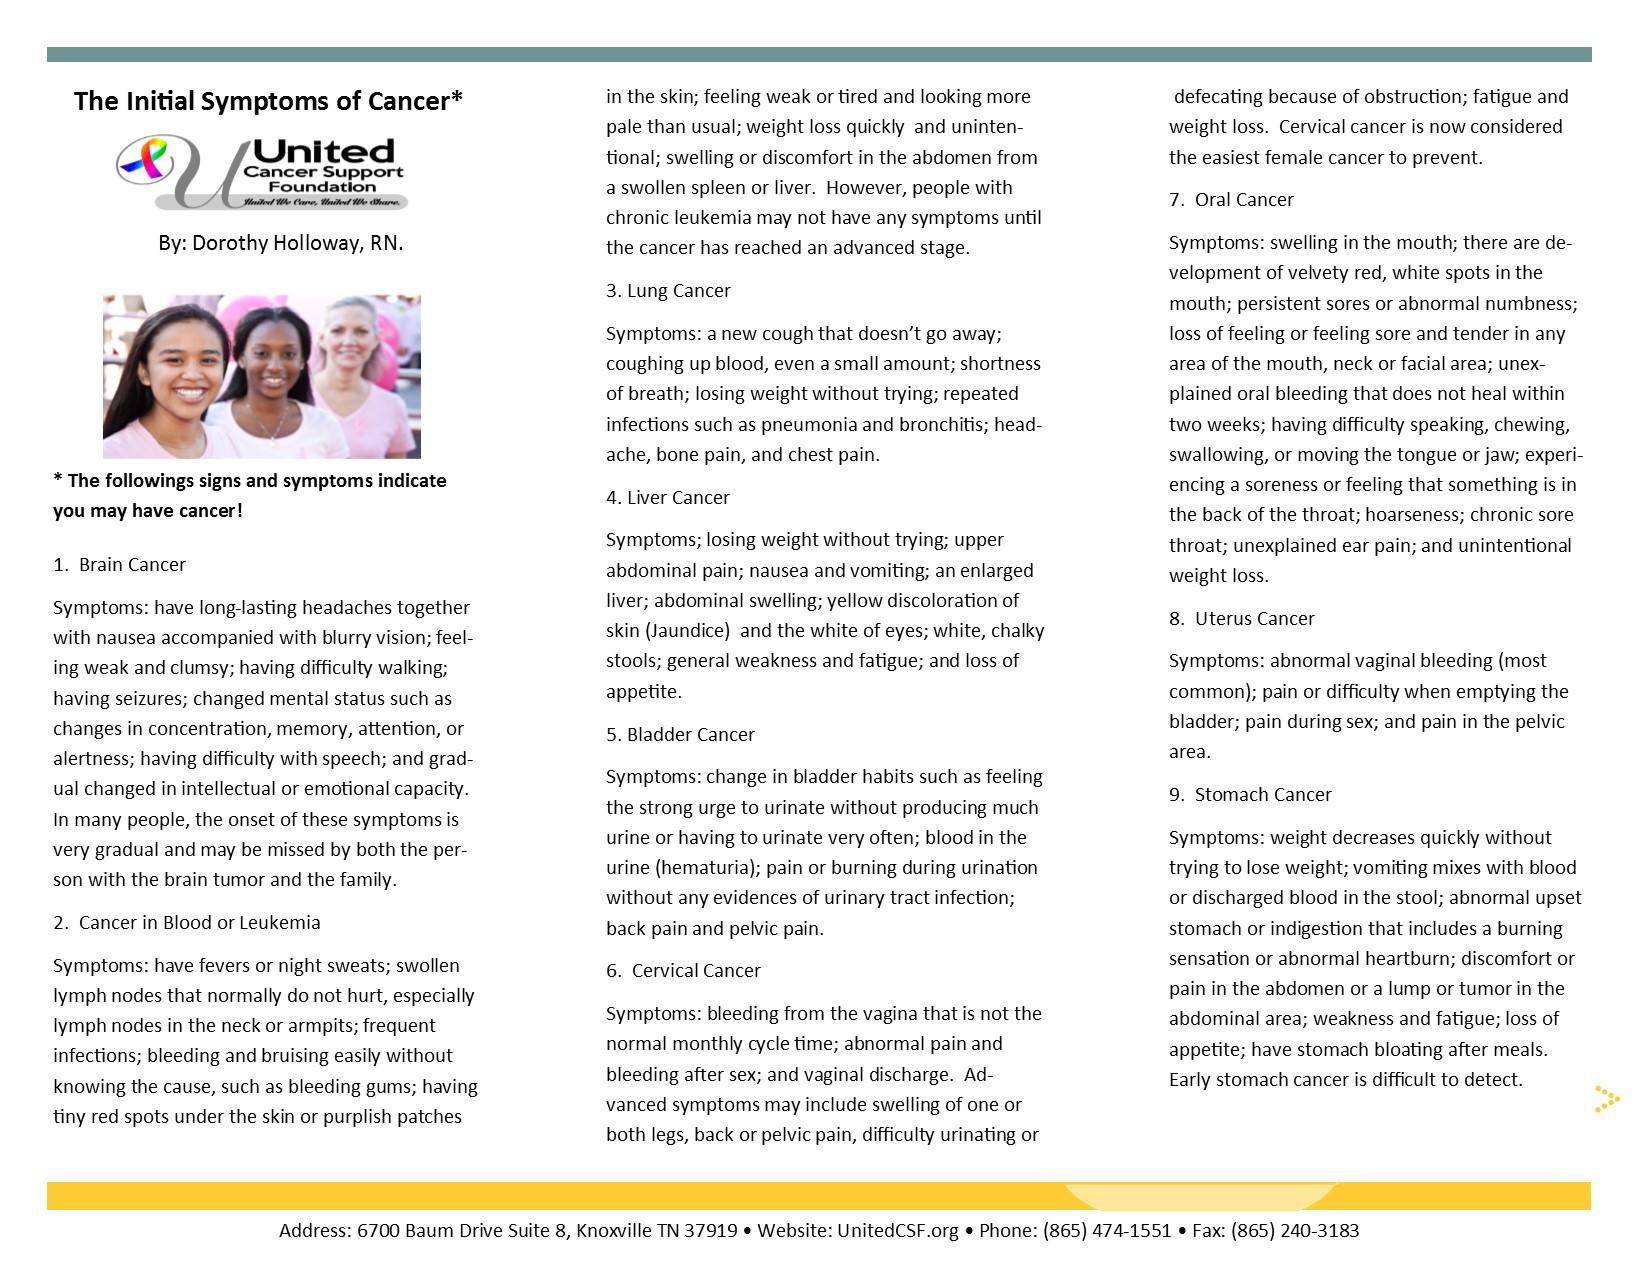 Publication Brochure By Dorothy Holloway, RN